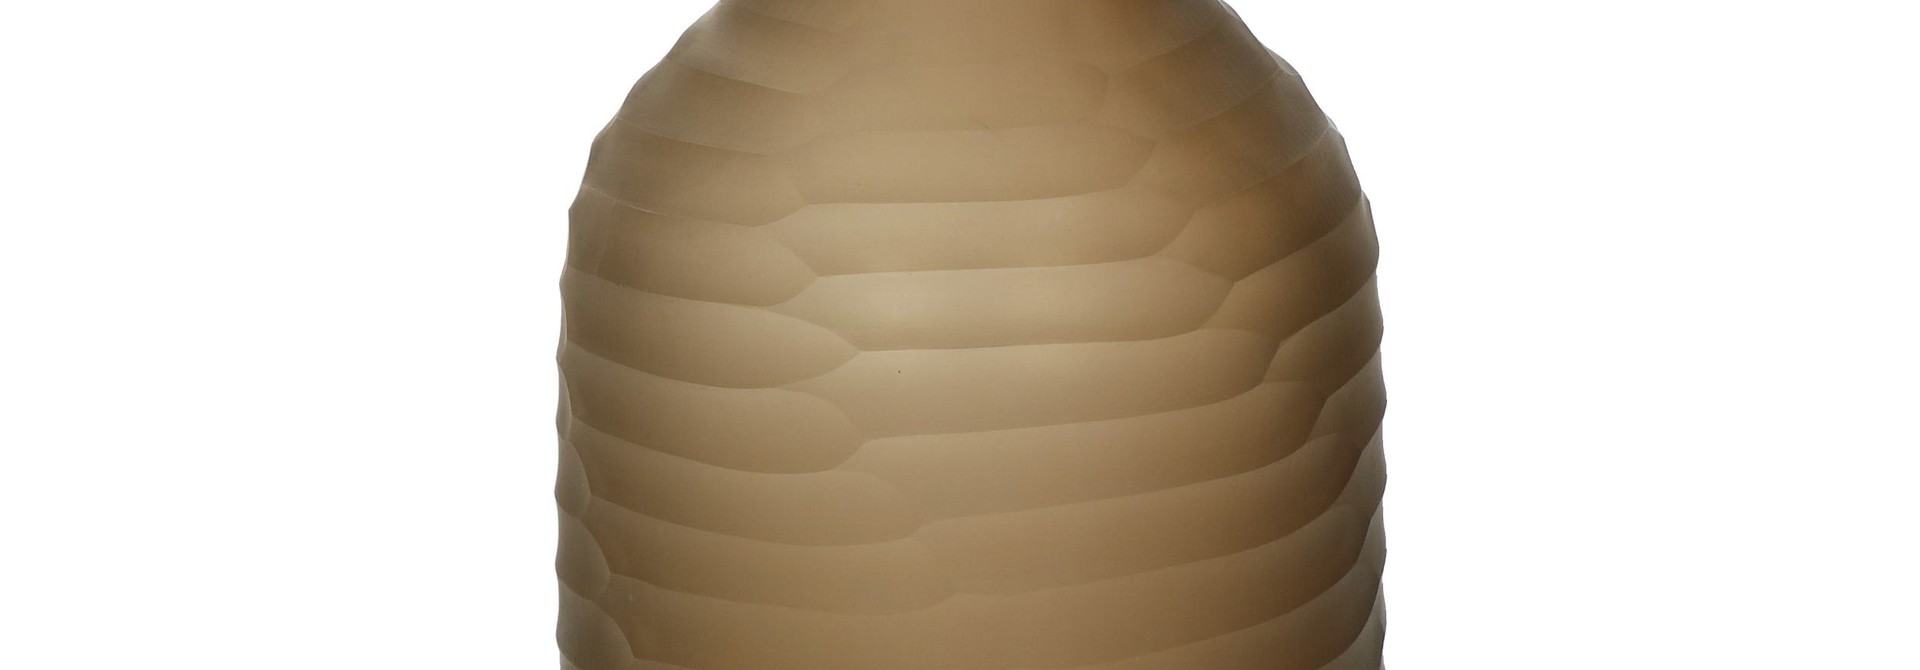 ORIZZO - VAAS - GLAS - DIA 16 X H 28 CM - BRUIN